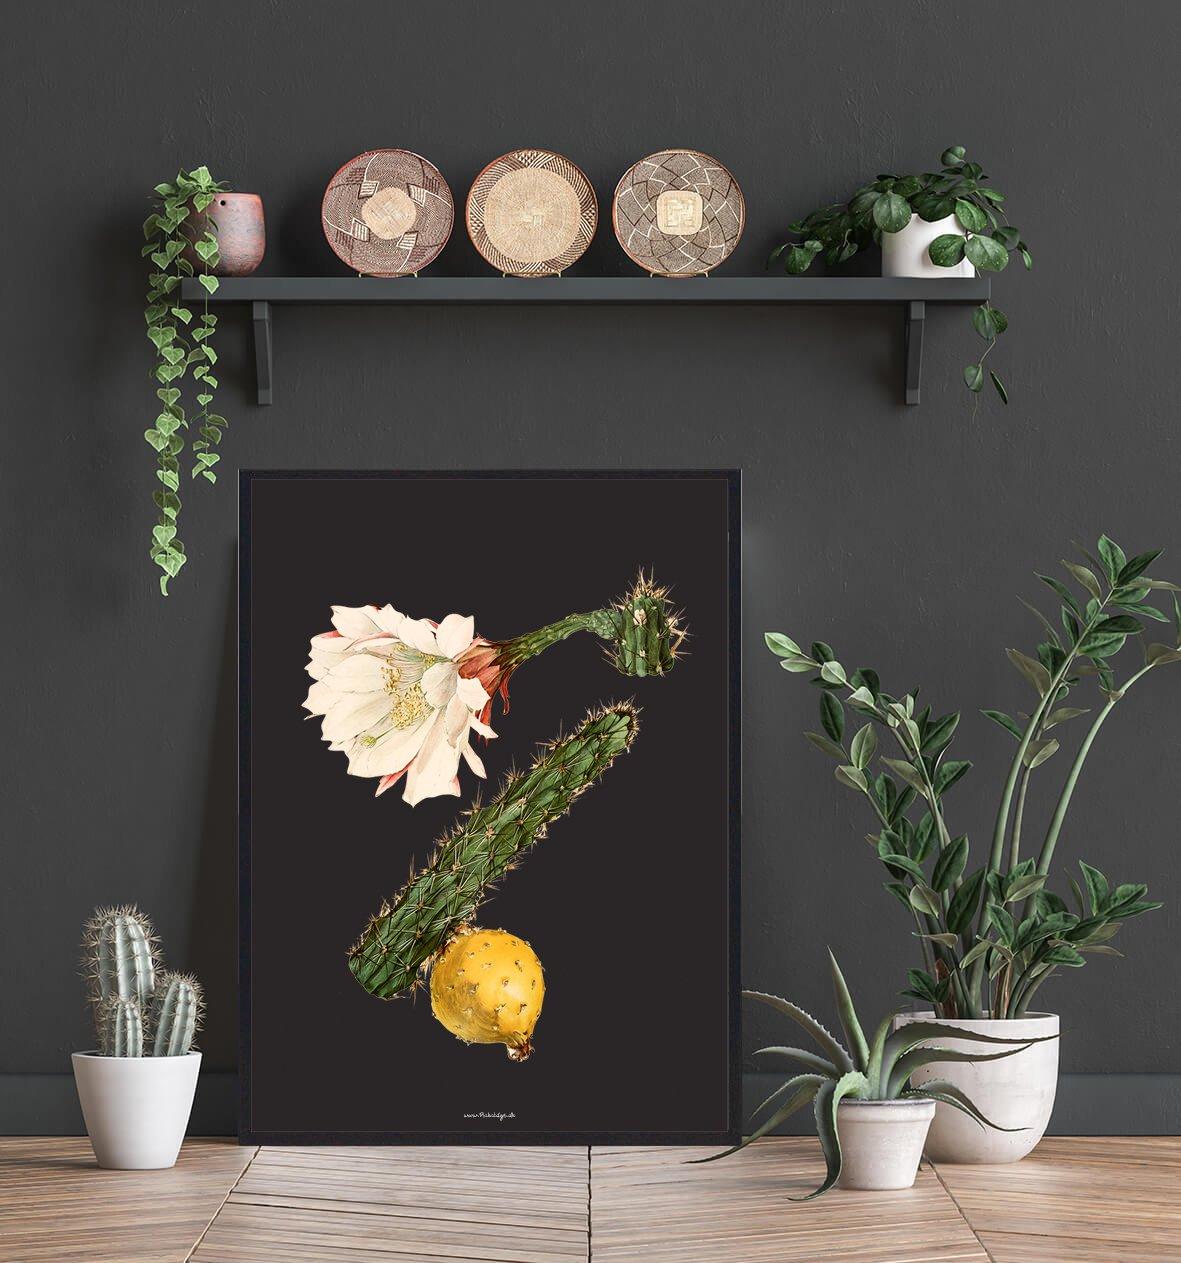 kaktus-smuk-bolig-2